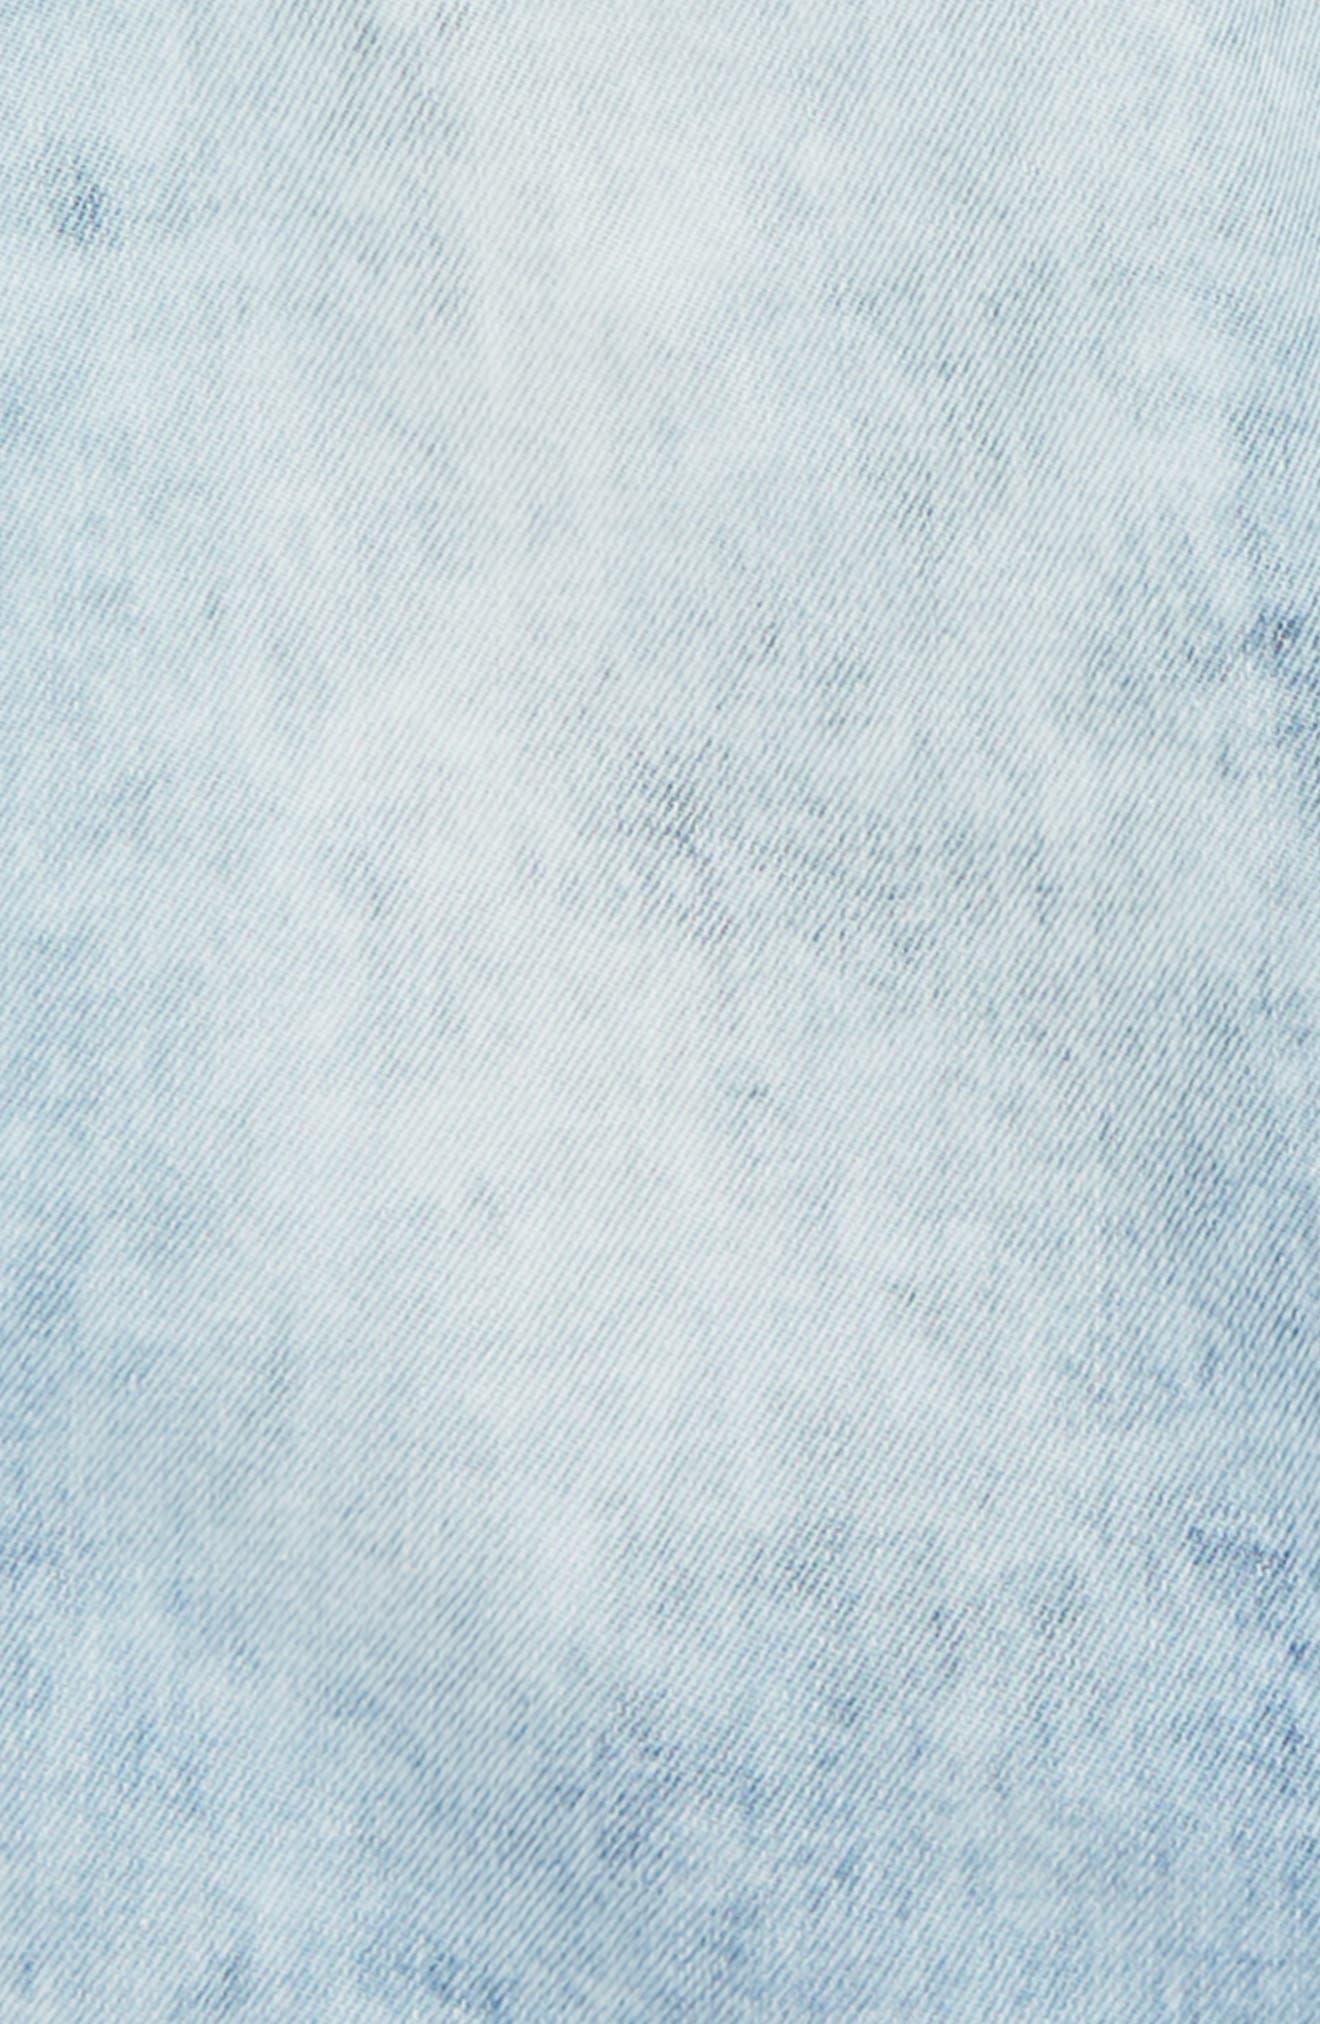 Denim Shorts,                             Alternate thumbnail 2, color,                             450